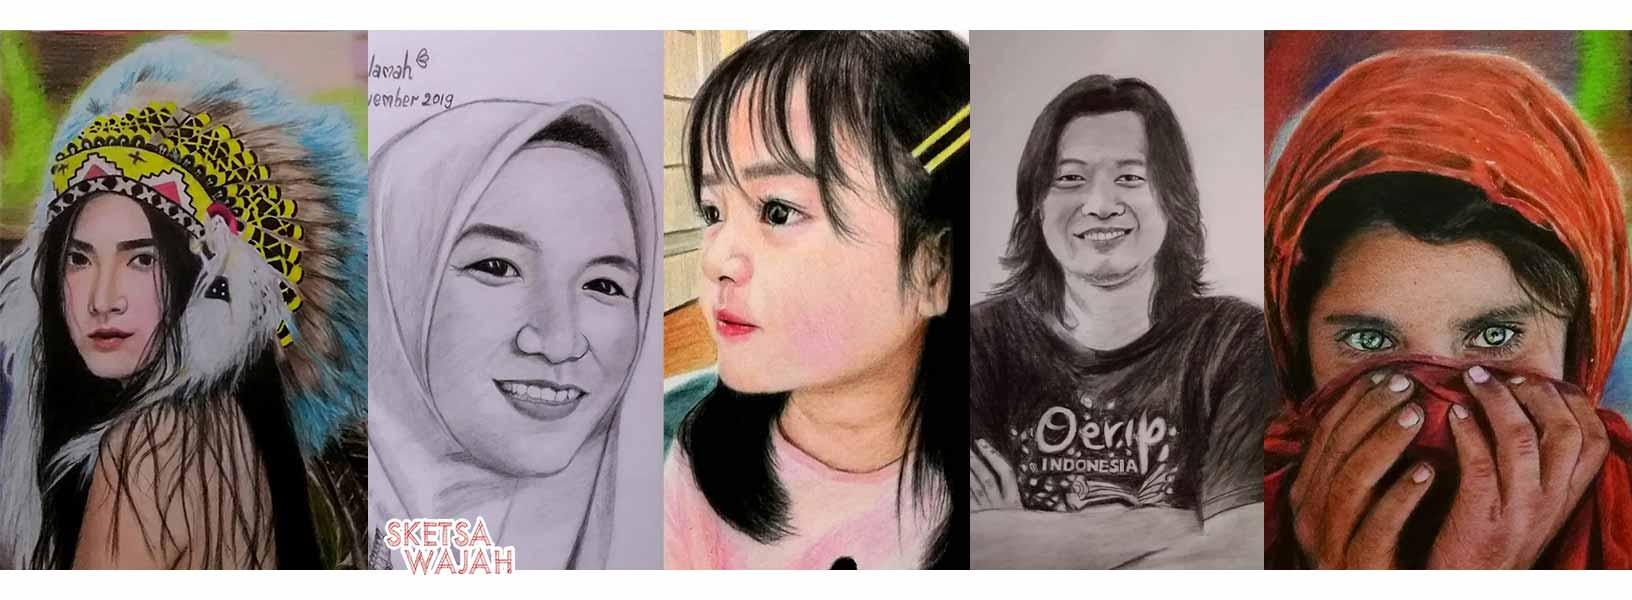 Karya Fatintania qn sketcher Sketsa Wajah